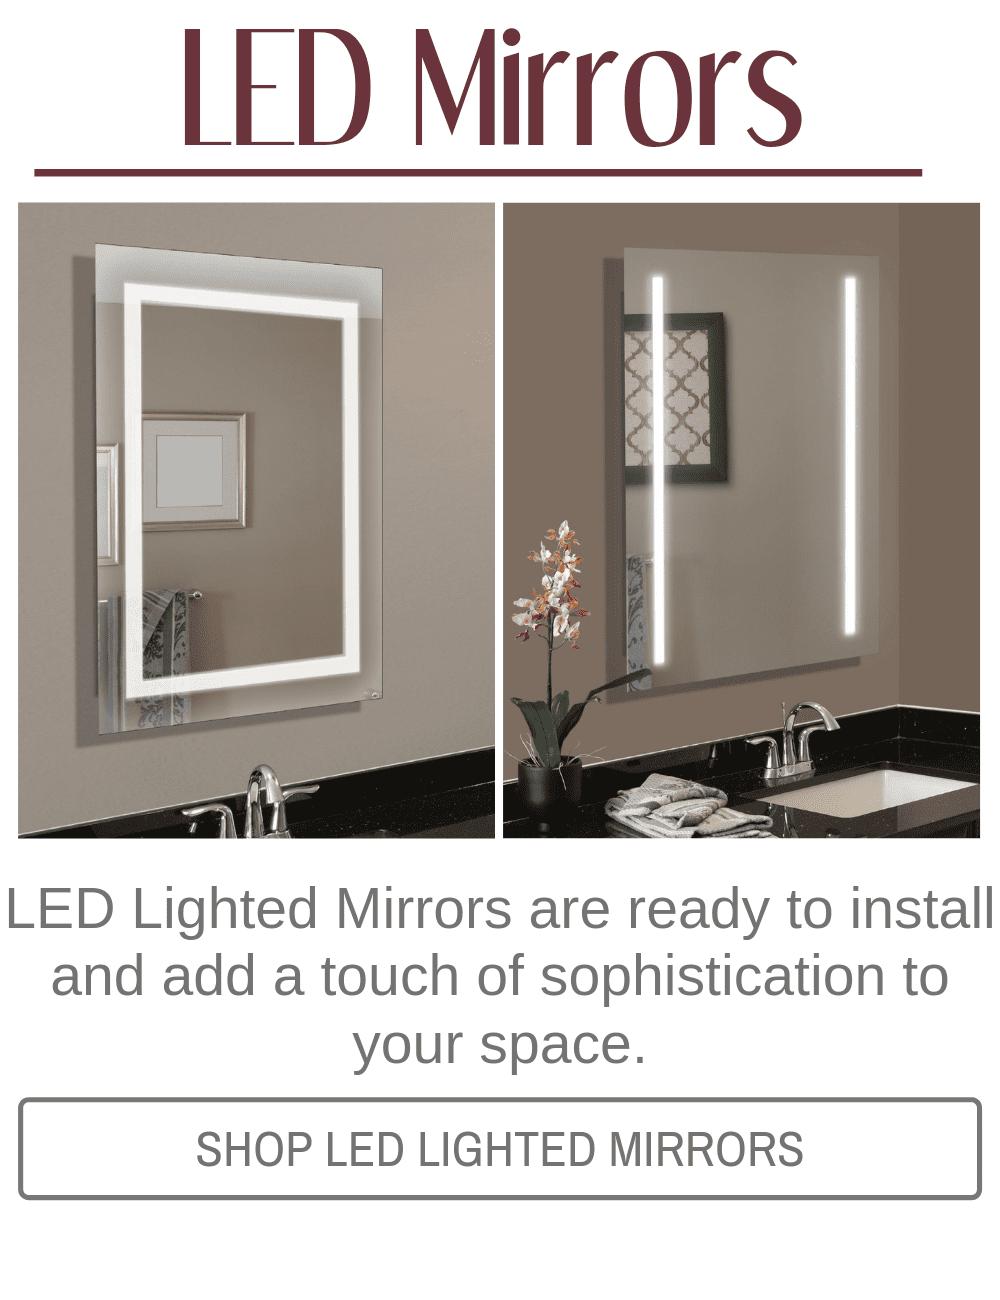 Custom Diy Bathroom Mirror Frame Kits